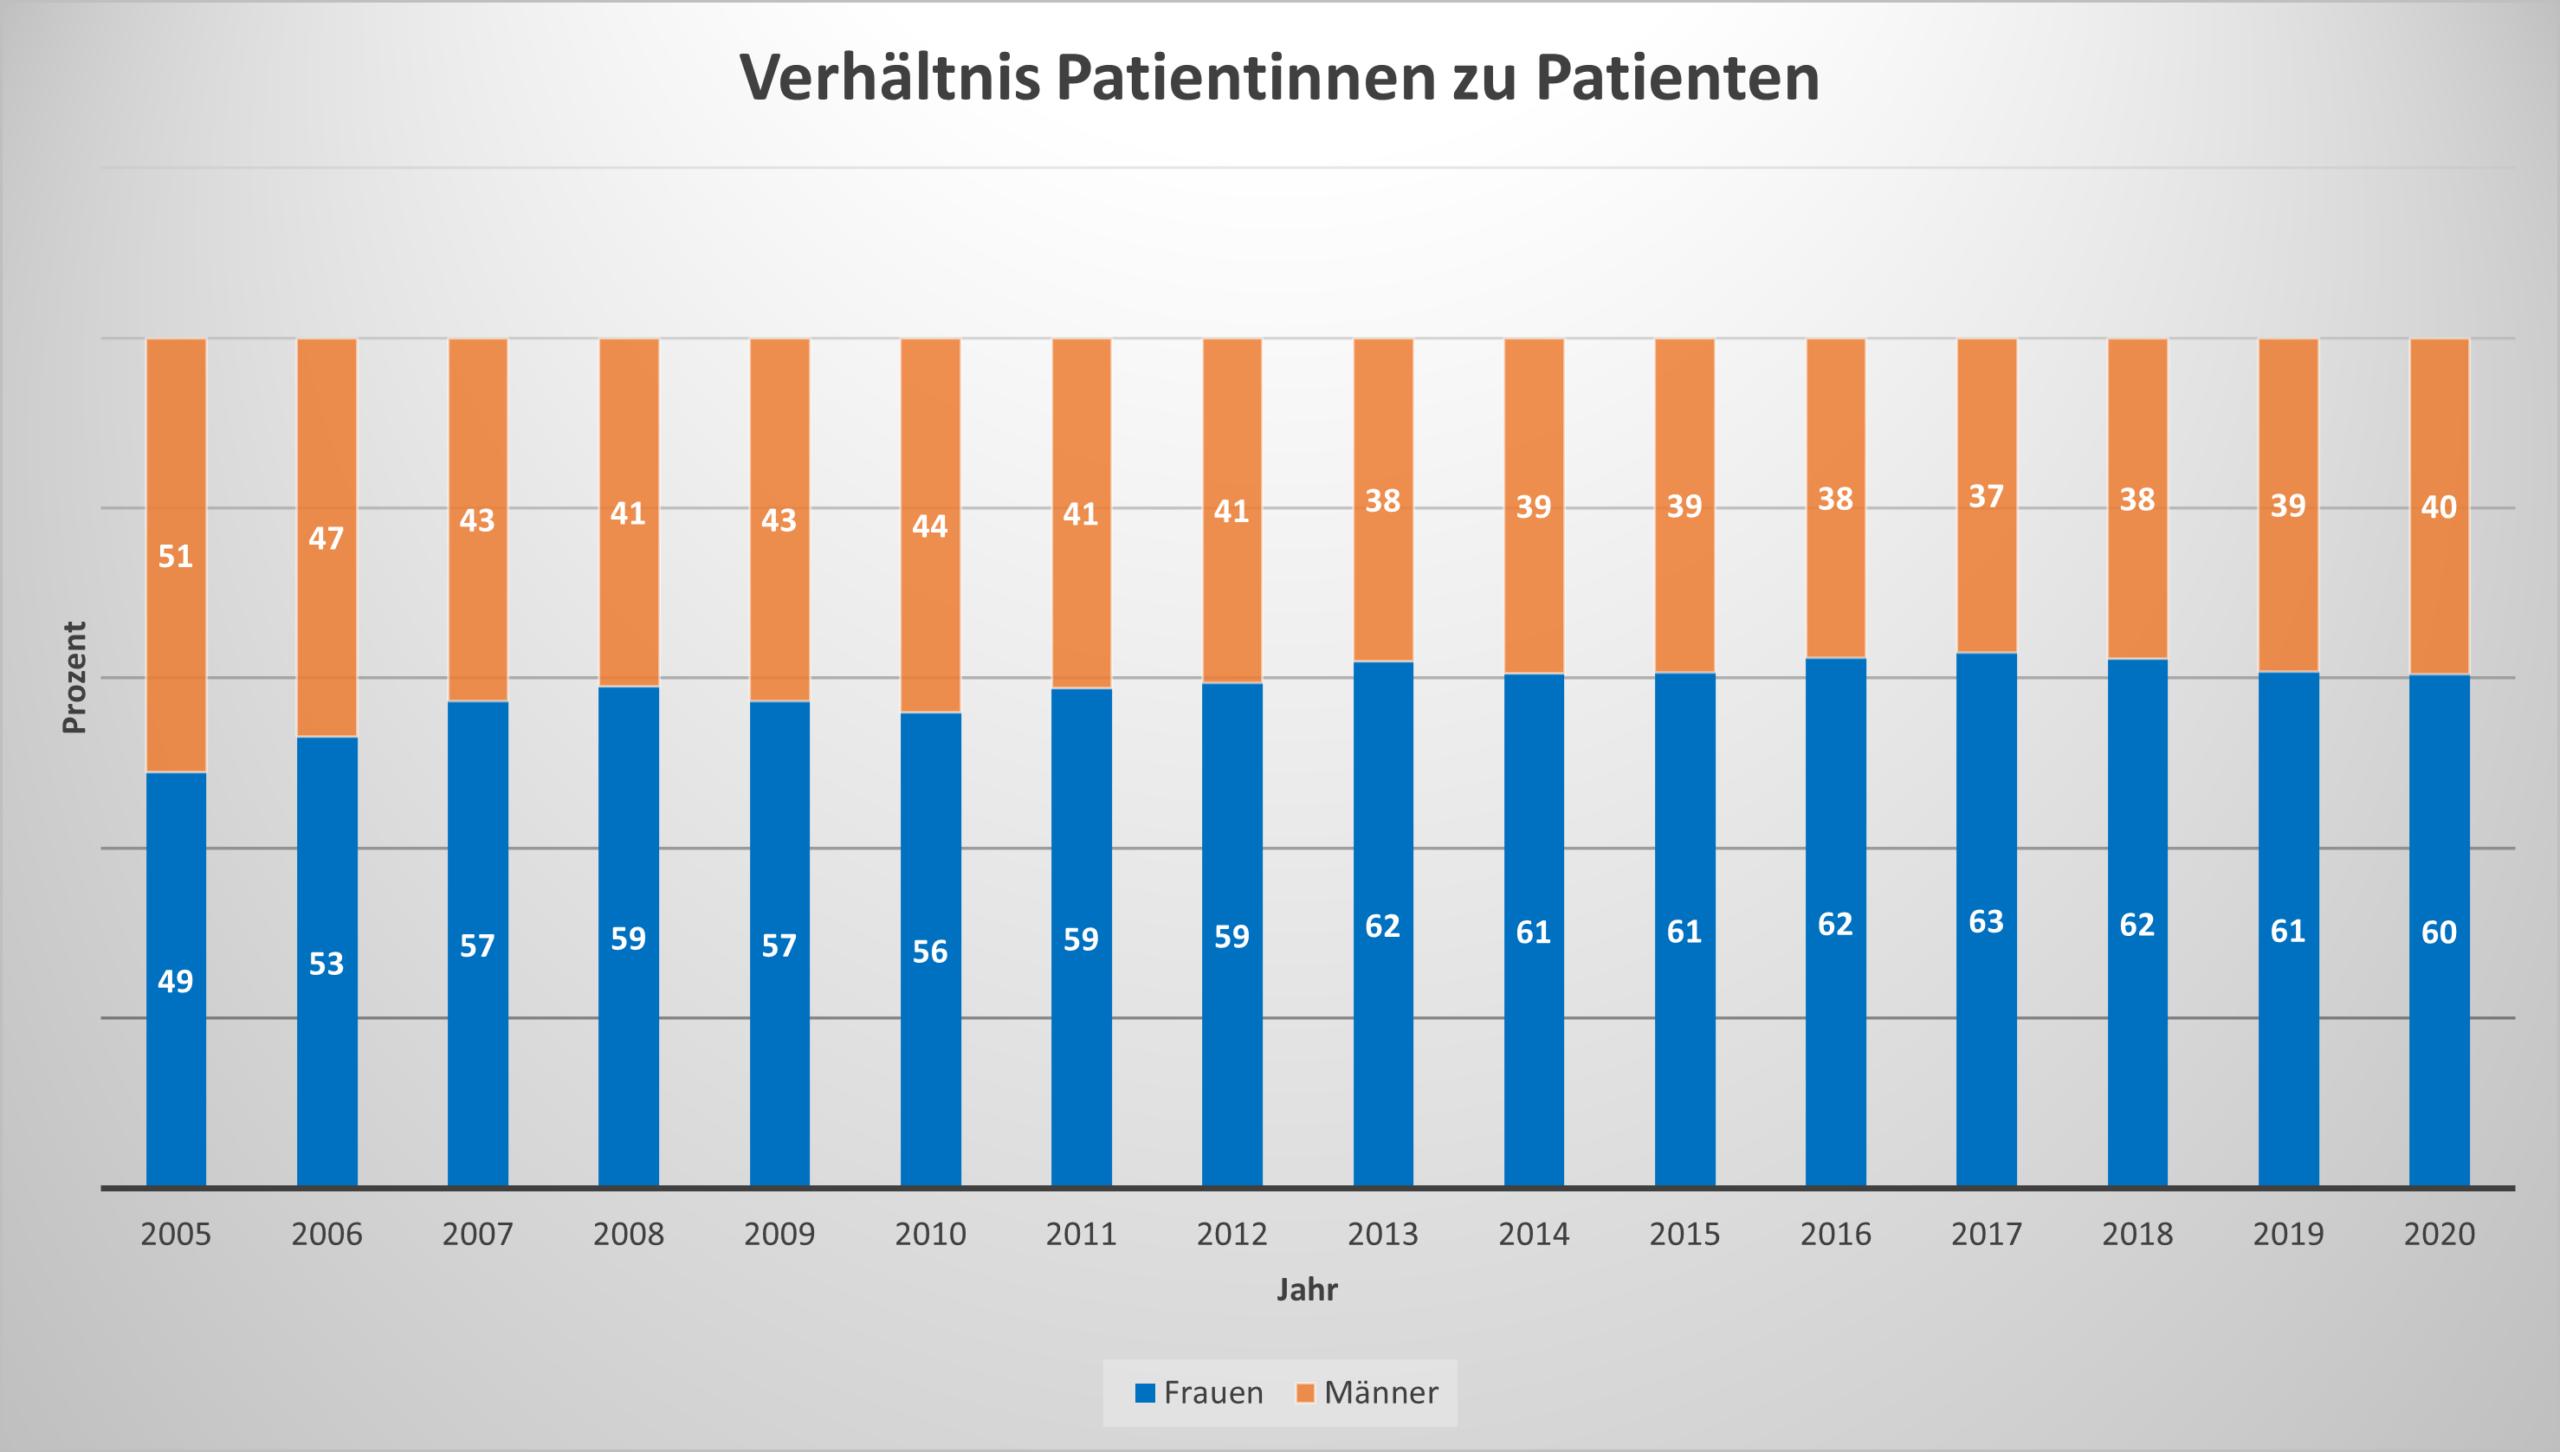 Statistik Physiotherapie Verhältnis Frauen Männer